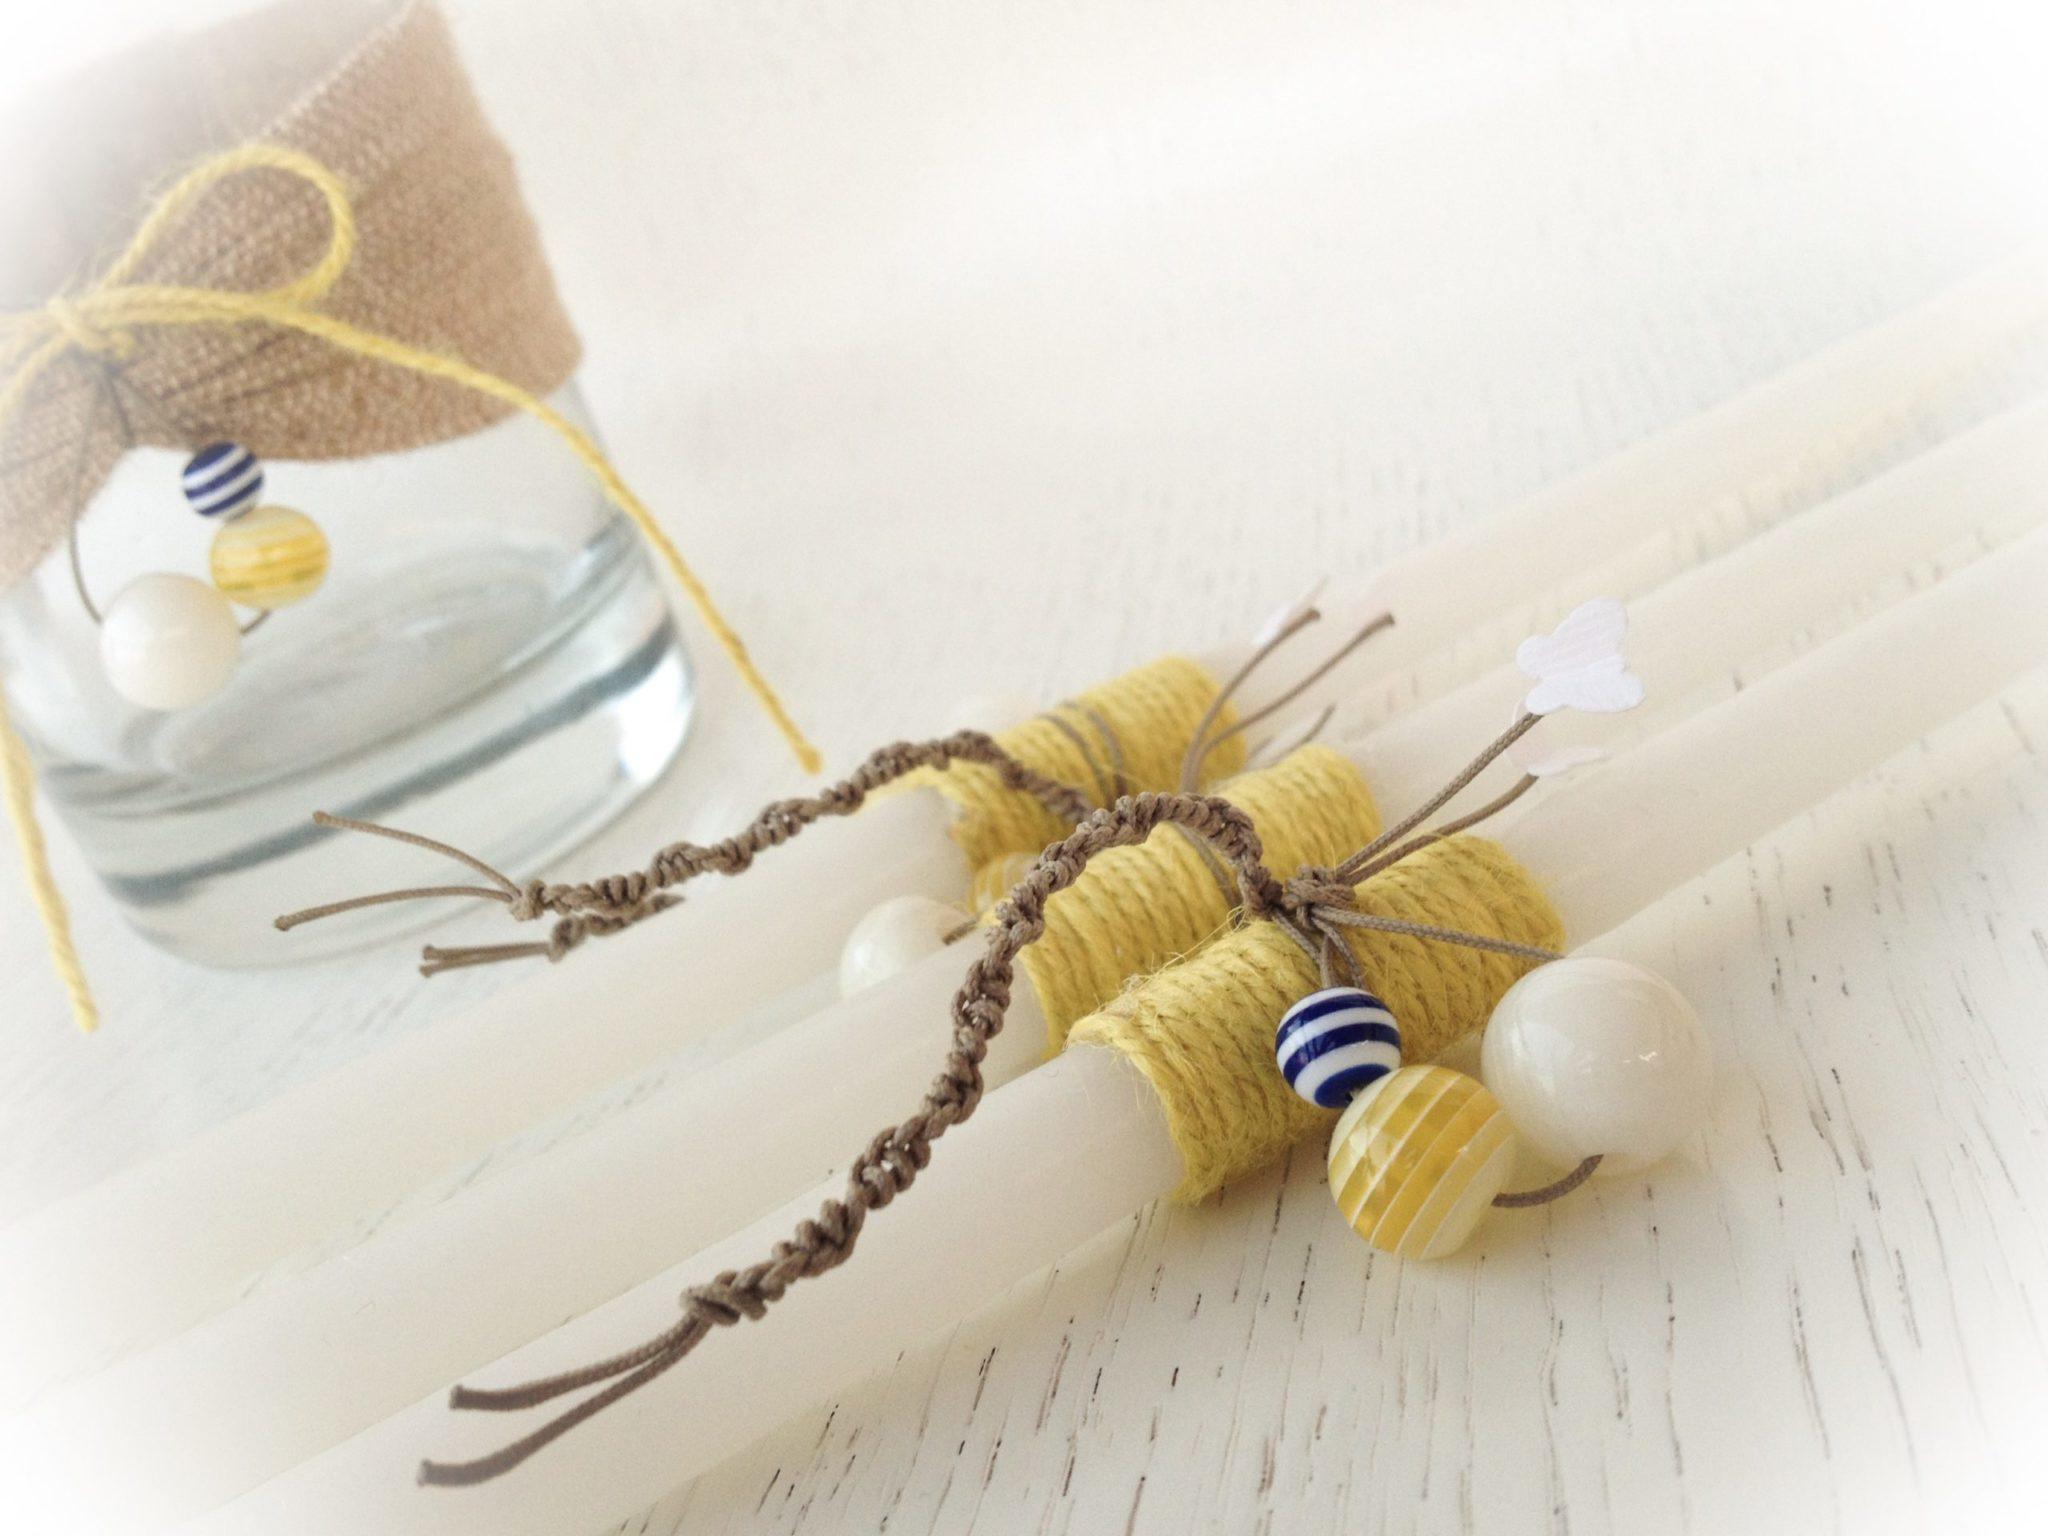 Snails And Butterflies-baptism oilset-candles-detail